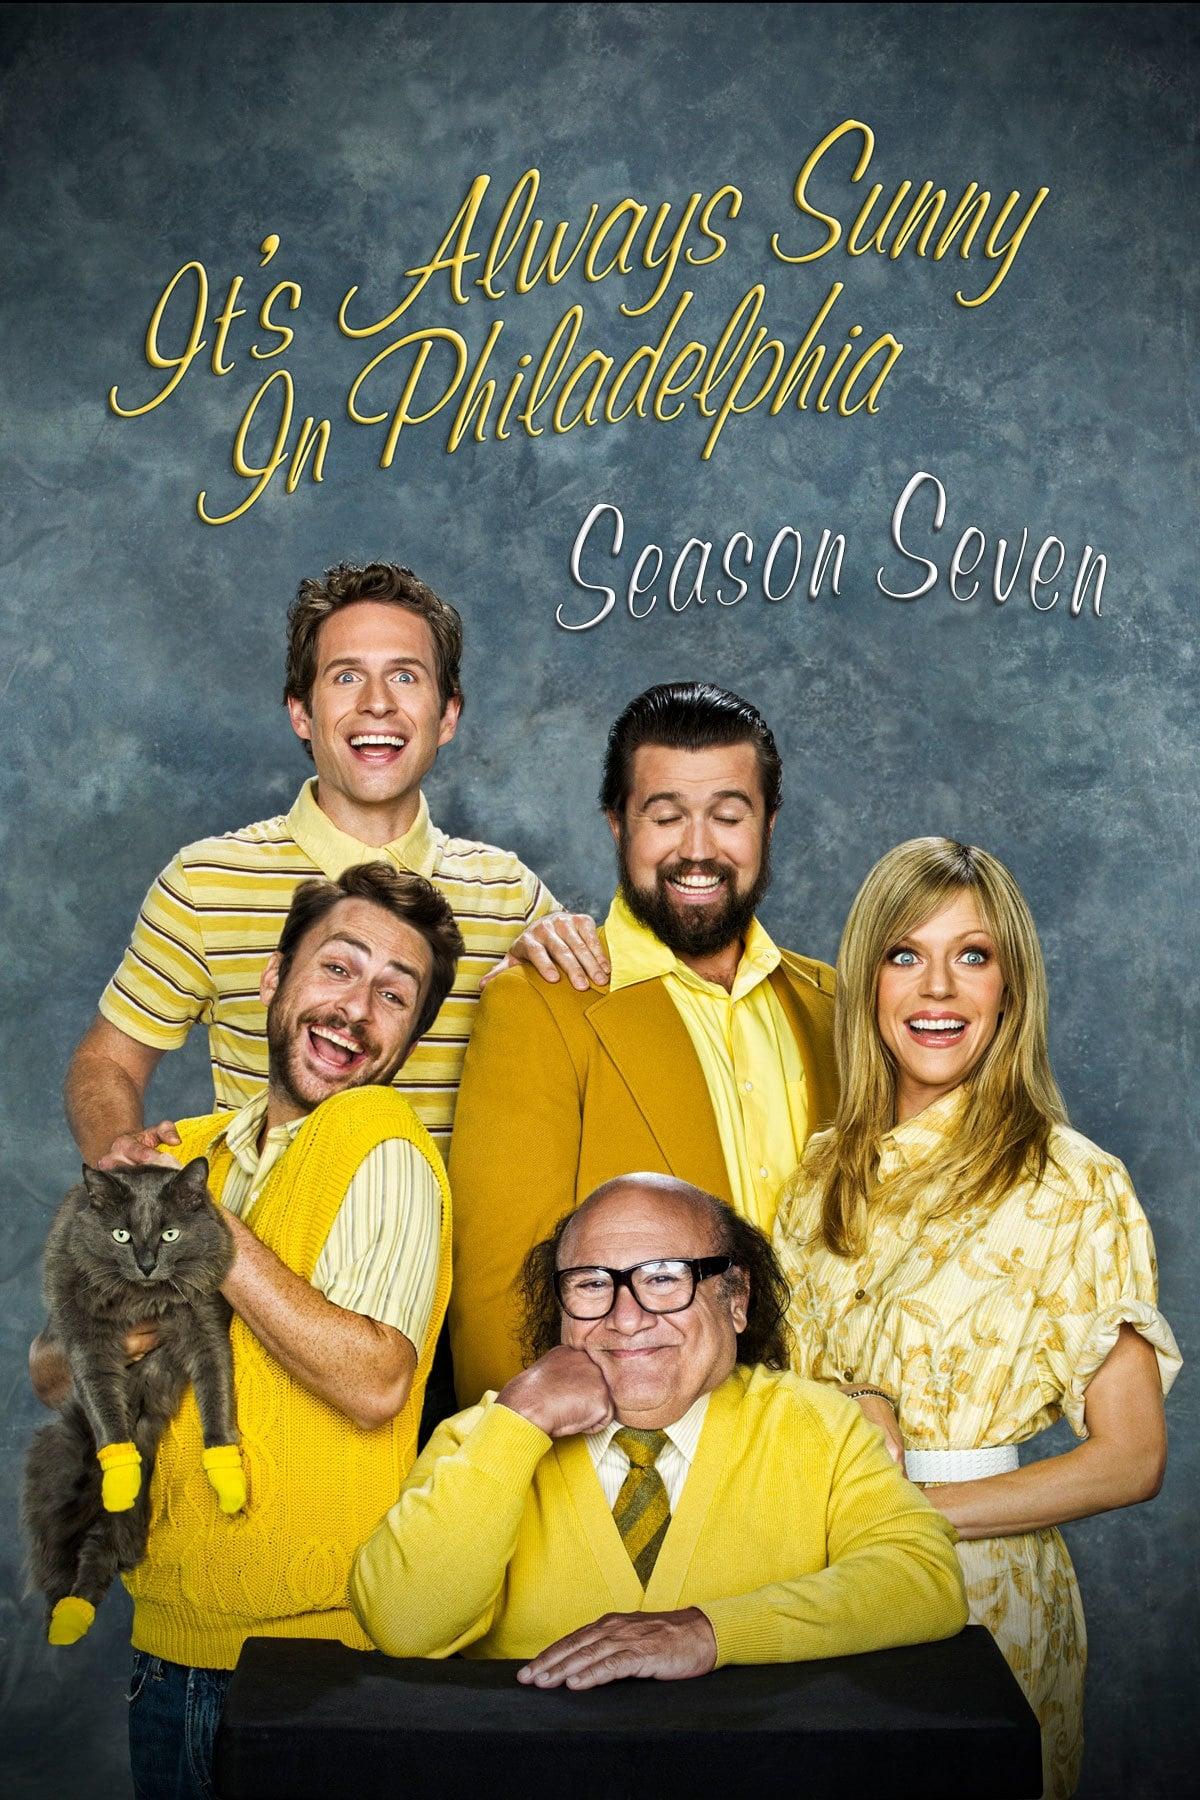 It's Always Sunny in Philadelphia Season 7